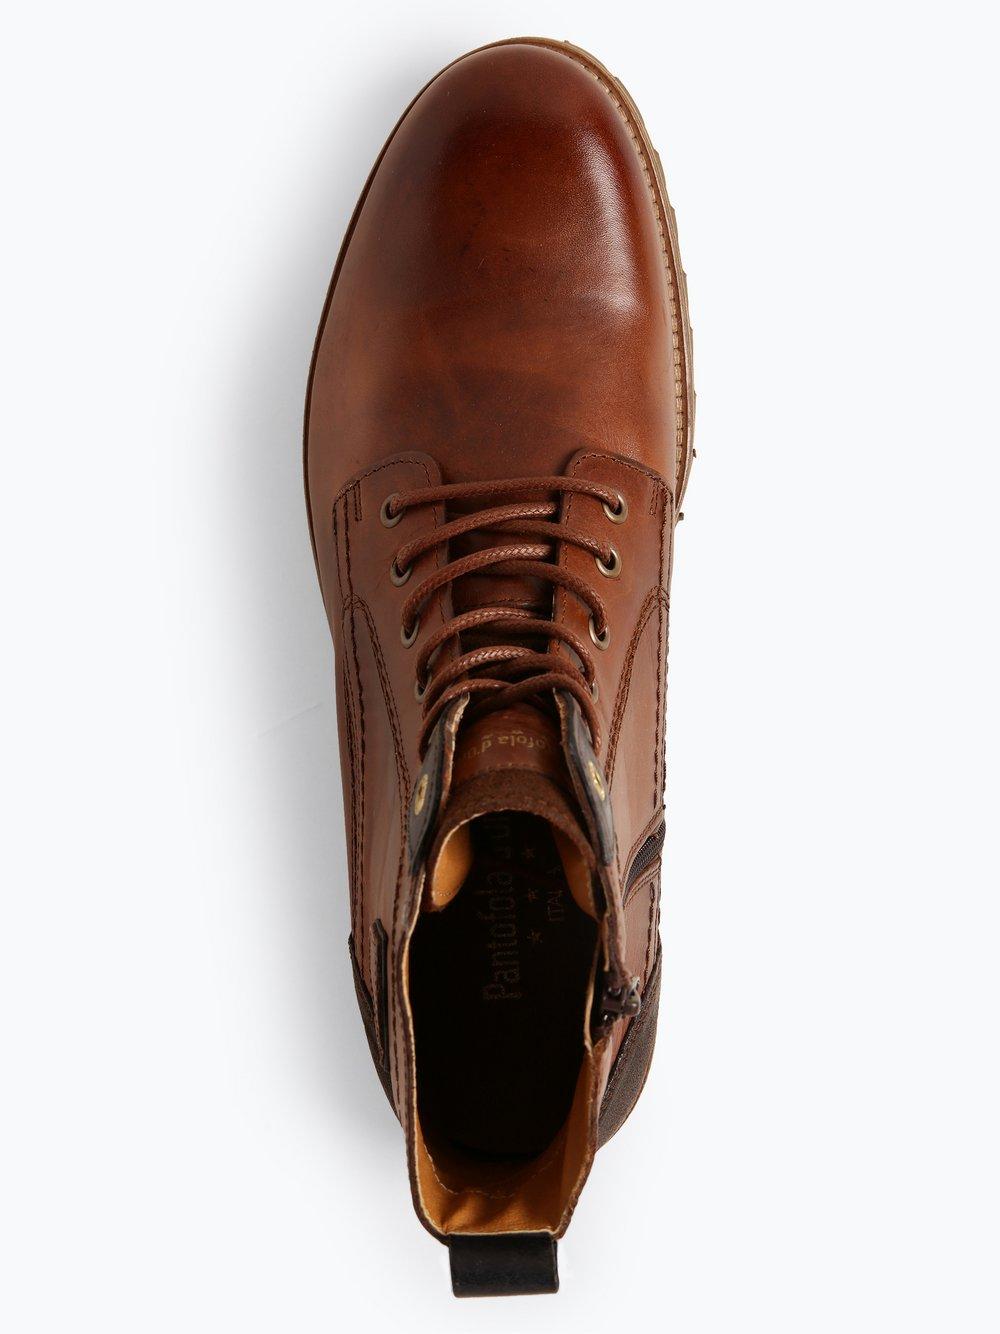 Ponzamo Online Boots Leder Herren Pantofola D'oro Aus QrdthsCx